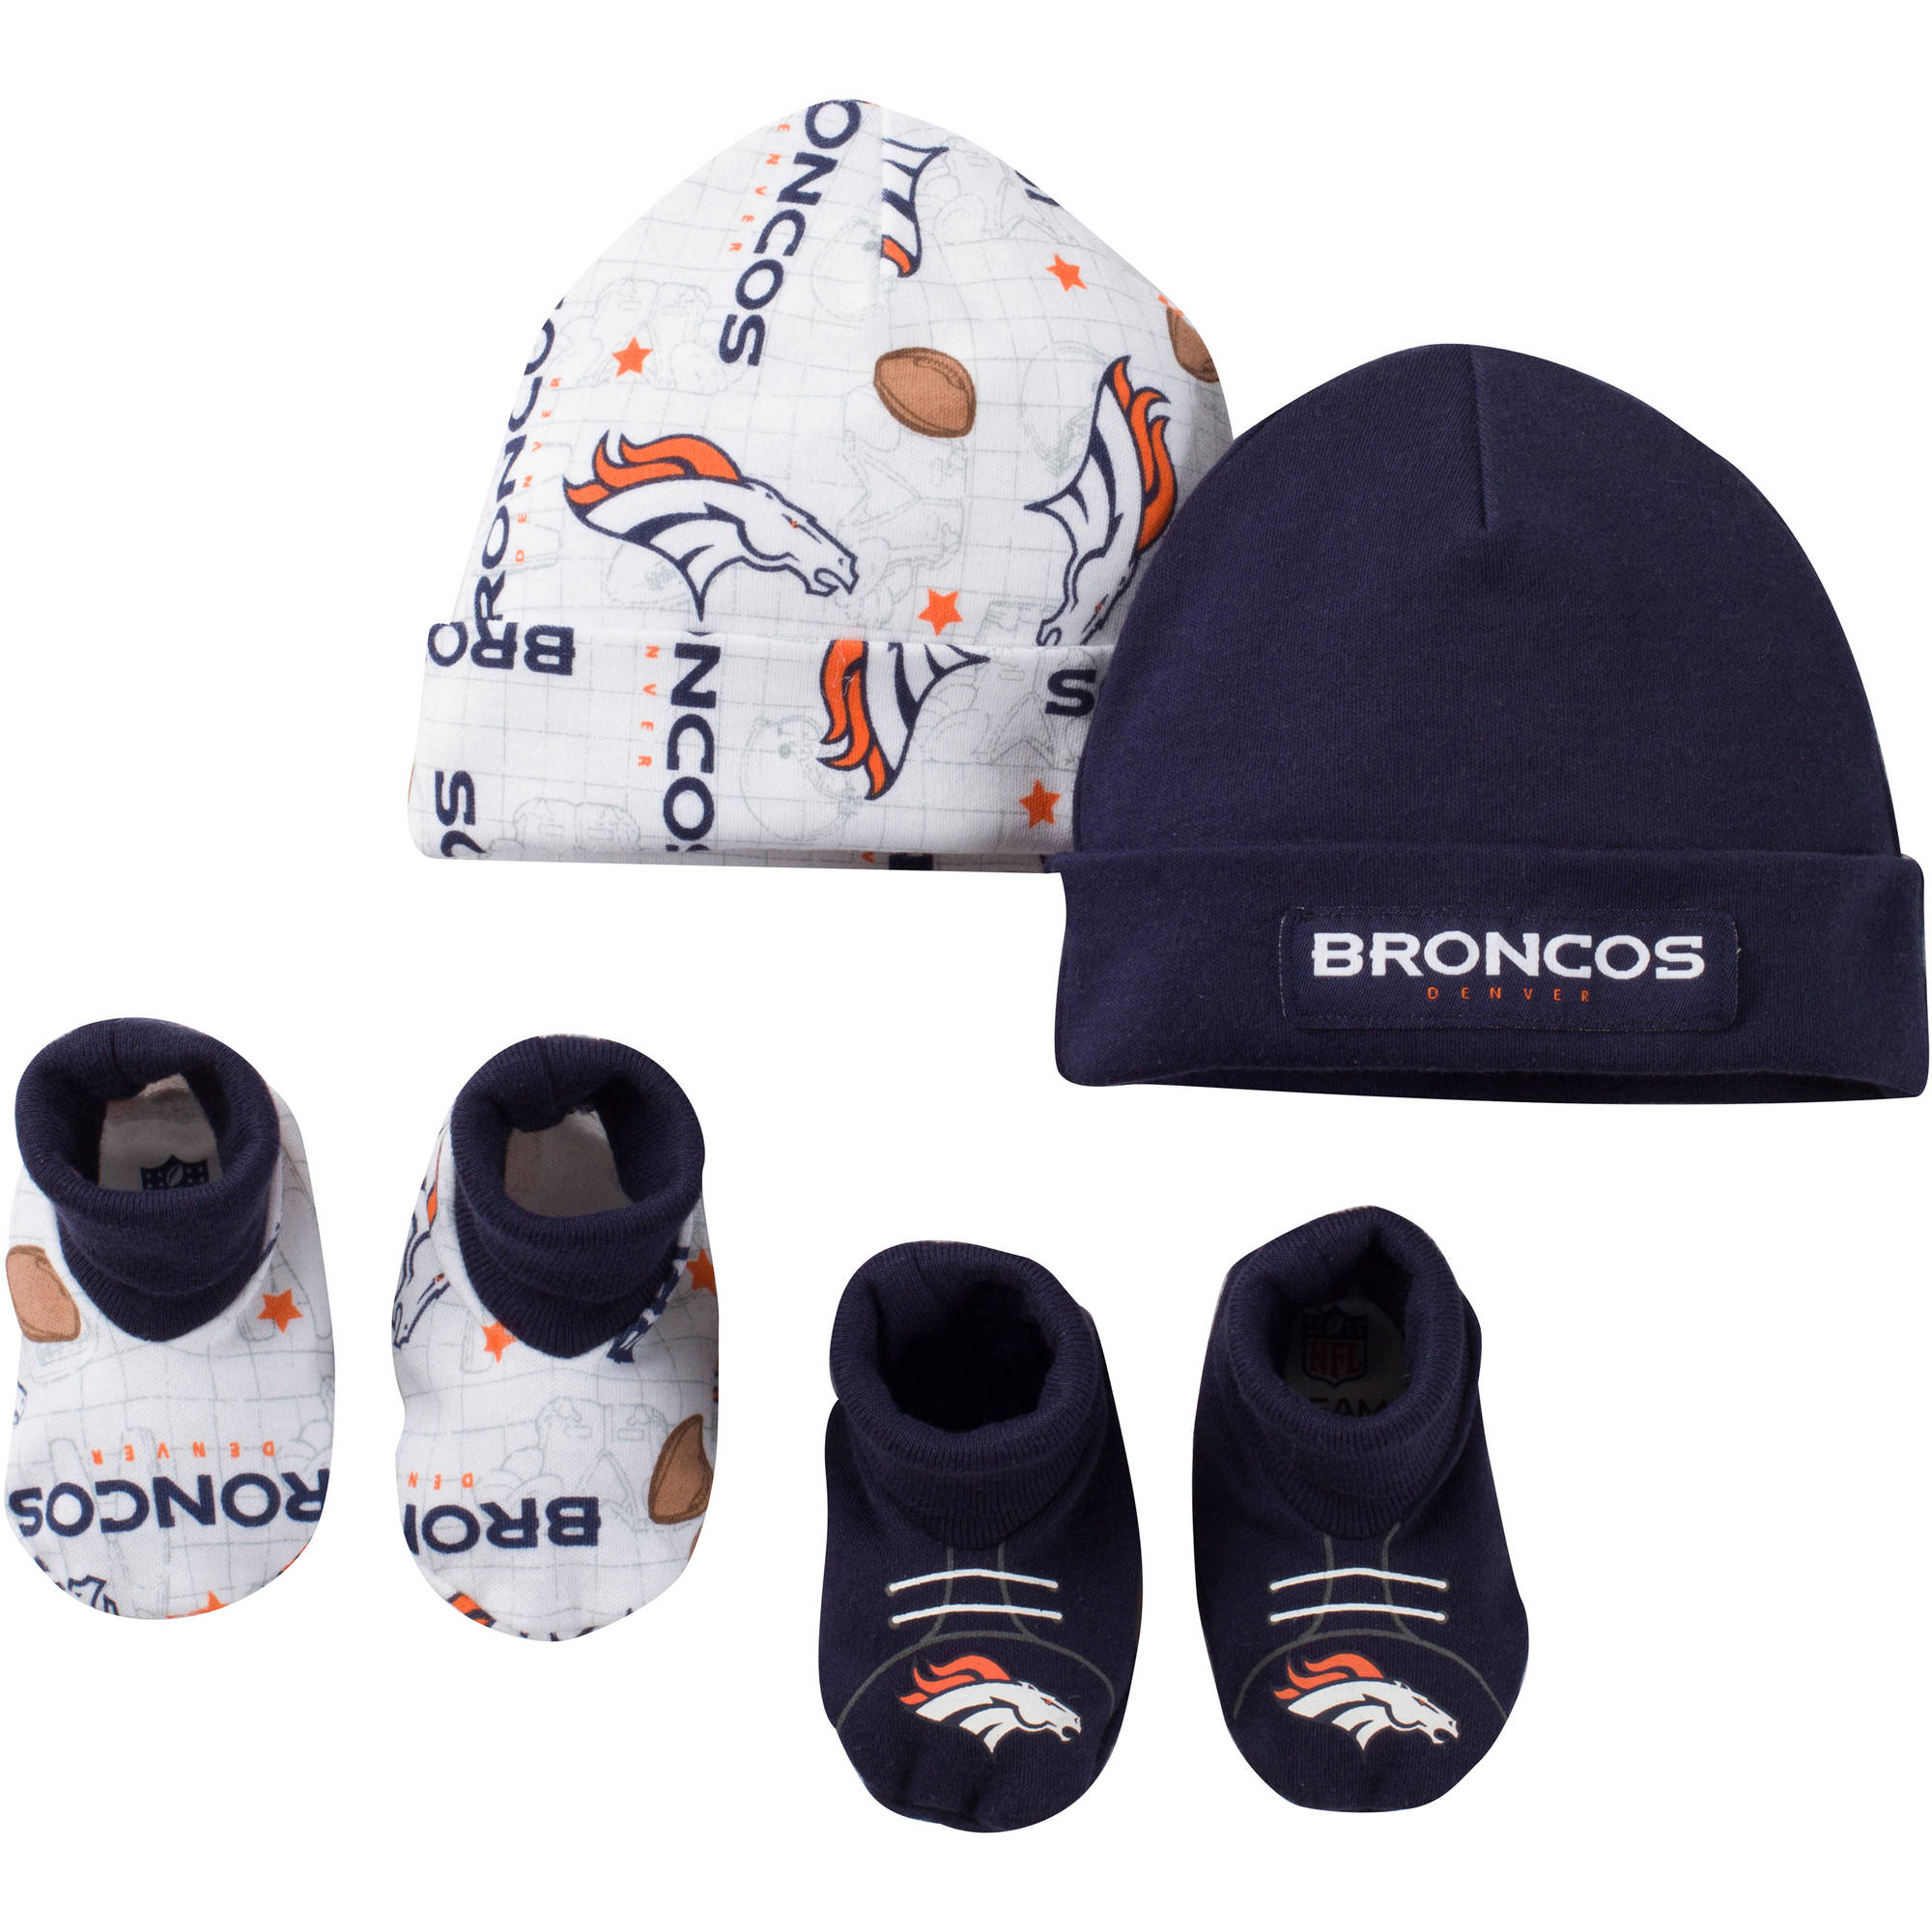 NFL Denver Broncos Baby Boys Accessory Set, 2 Caps and 2 Booties, 4-Piece